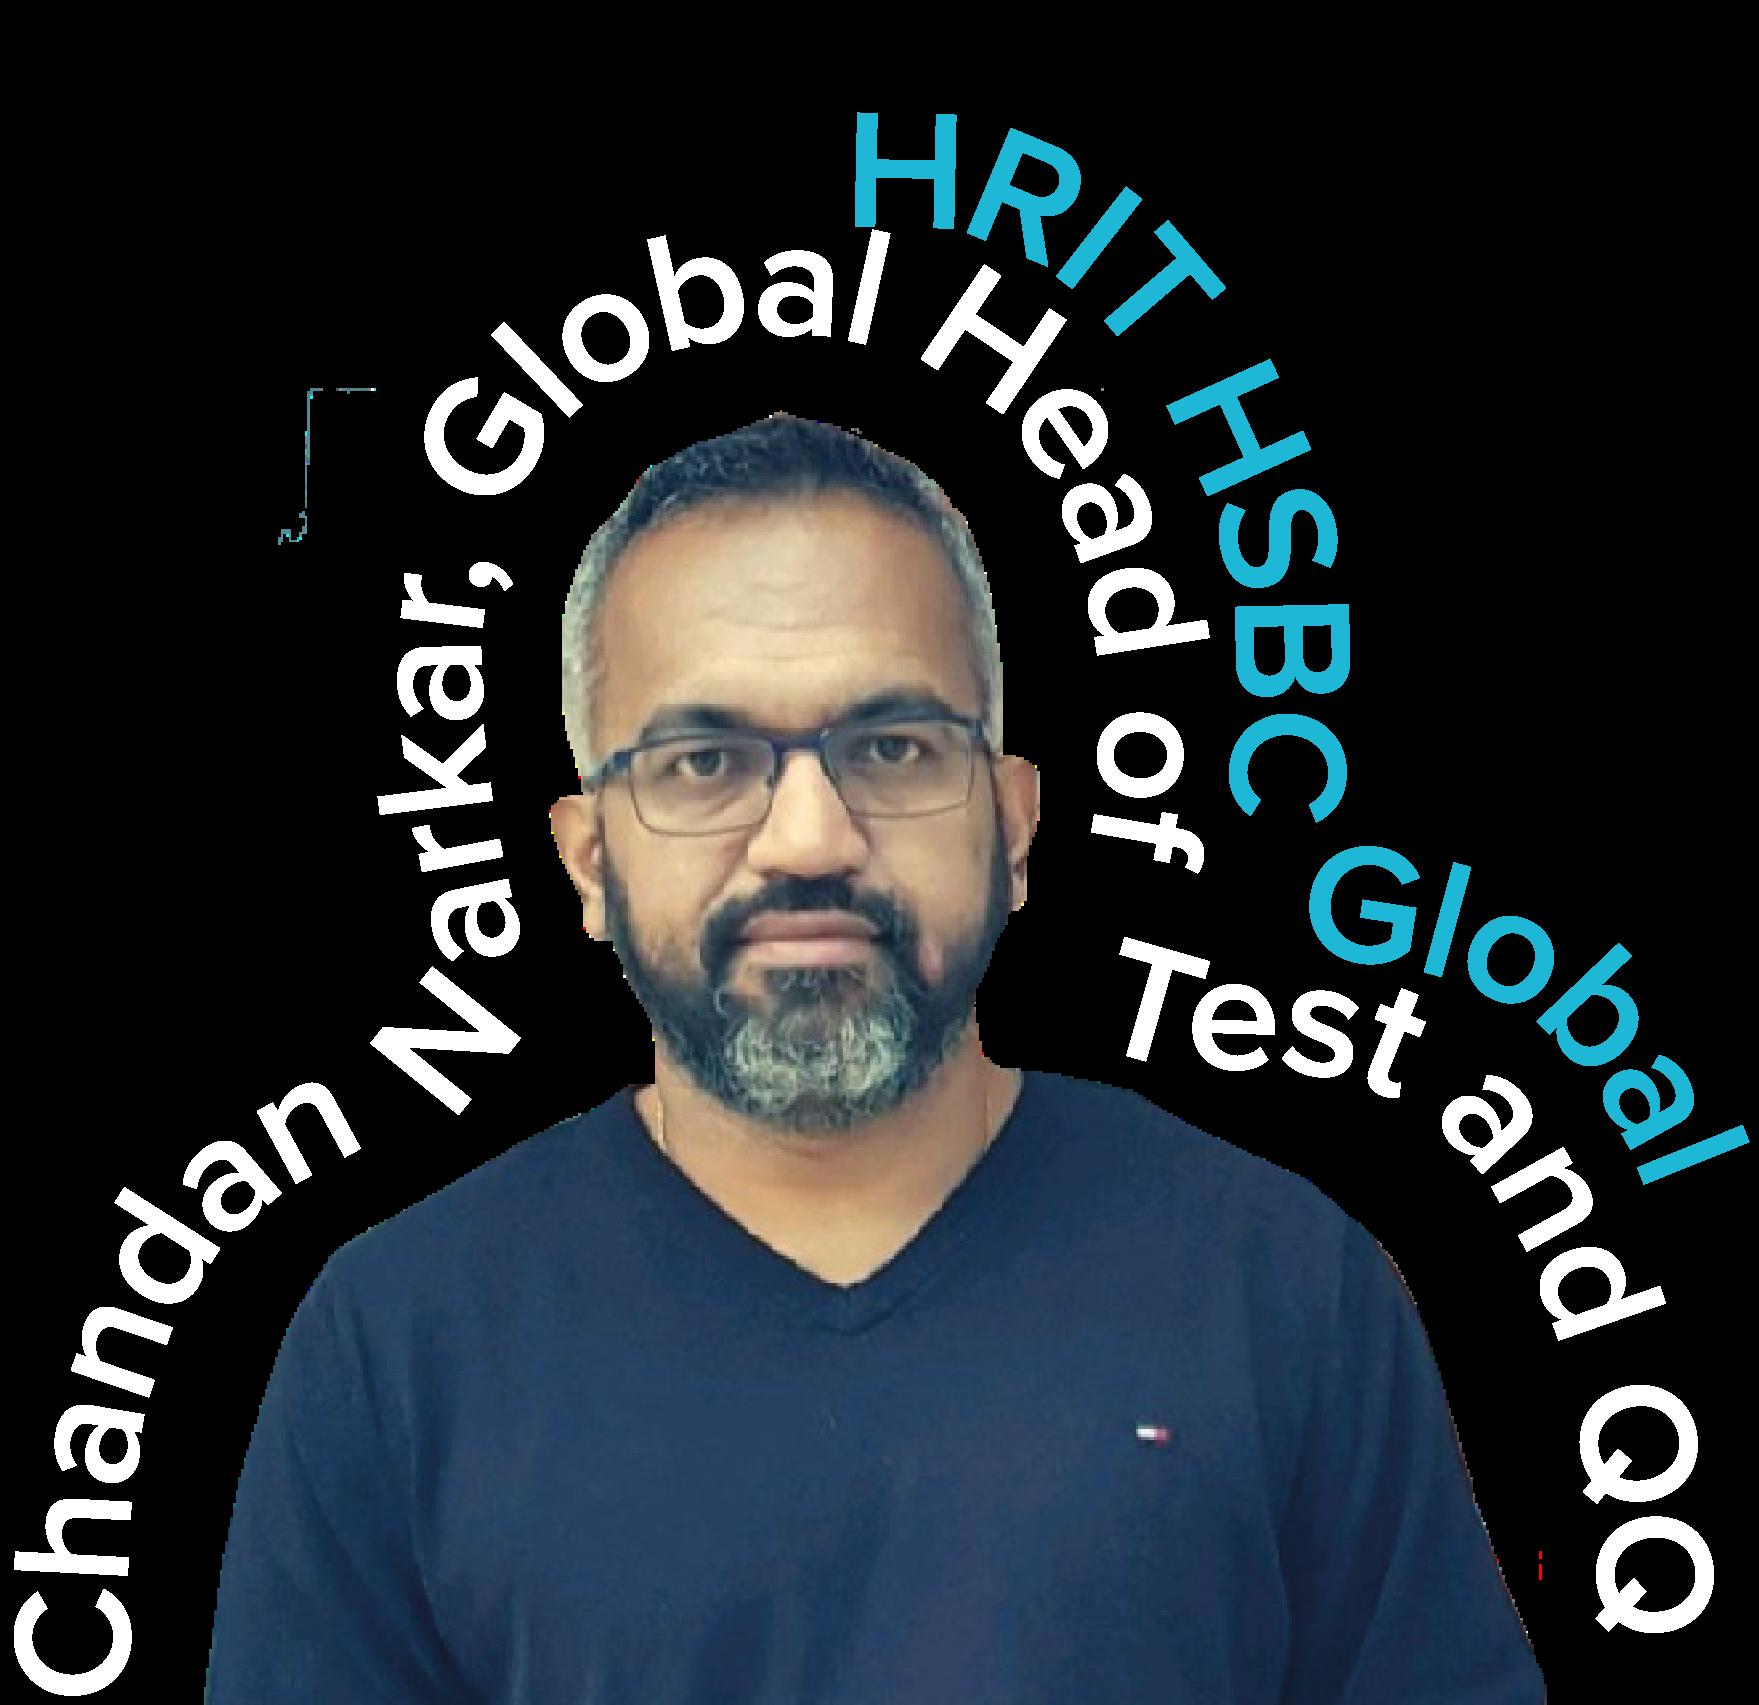 Chandan Narkar Global Head of Test and QA, HRIT HSBC Global